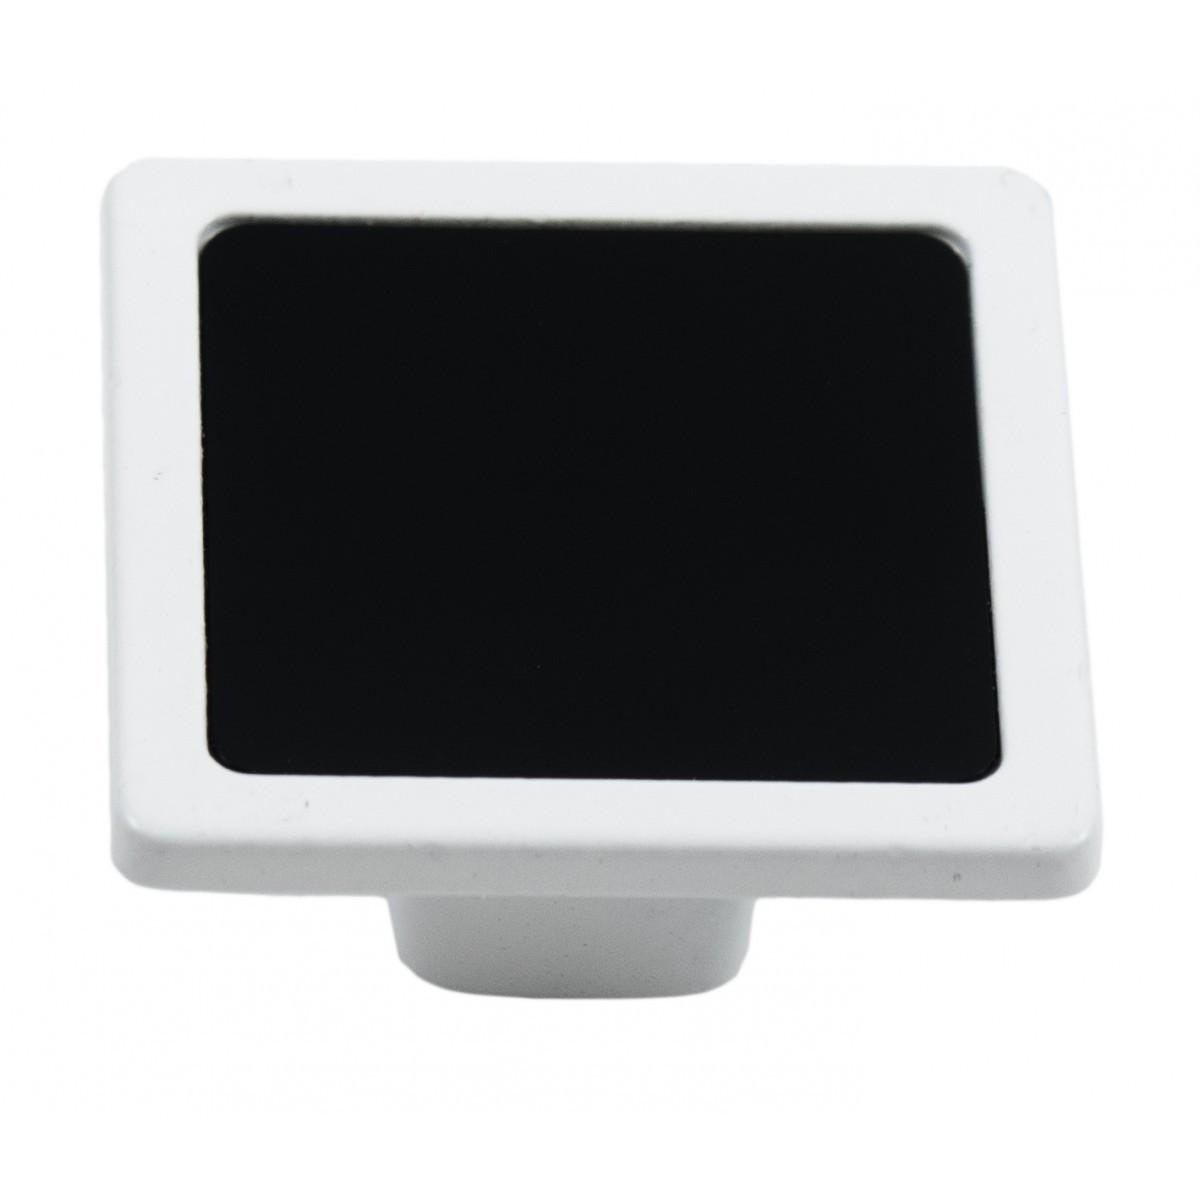 Ручка мебельная Ozkardesler 6083-013/011 SIRA DUGME Белая-Черная